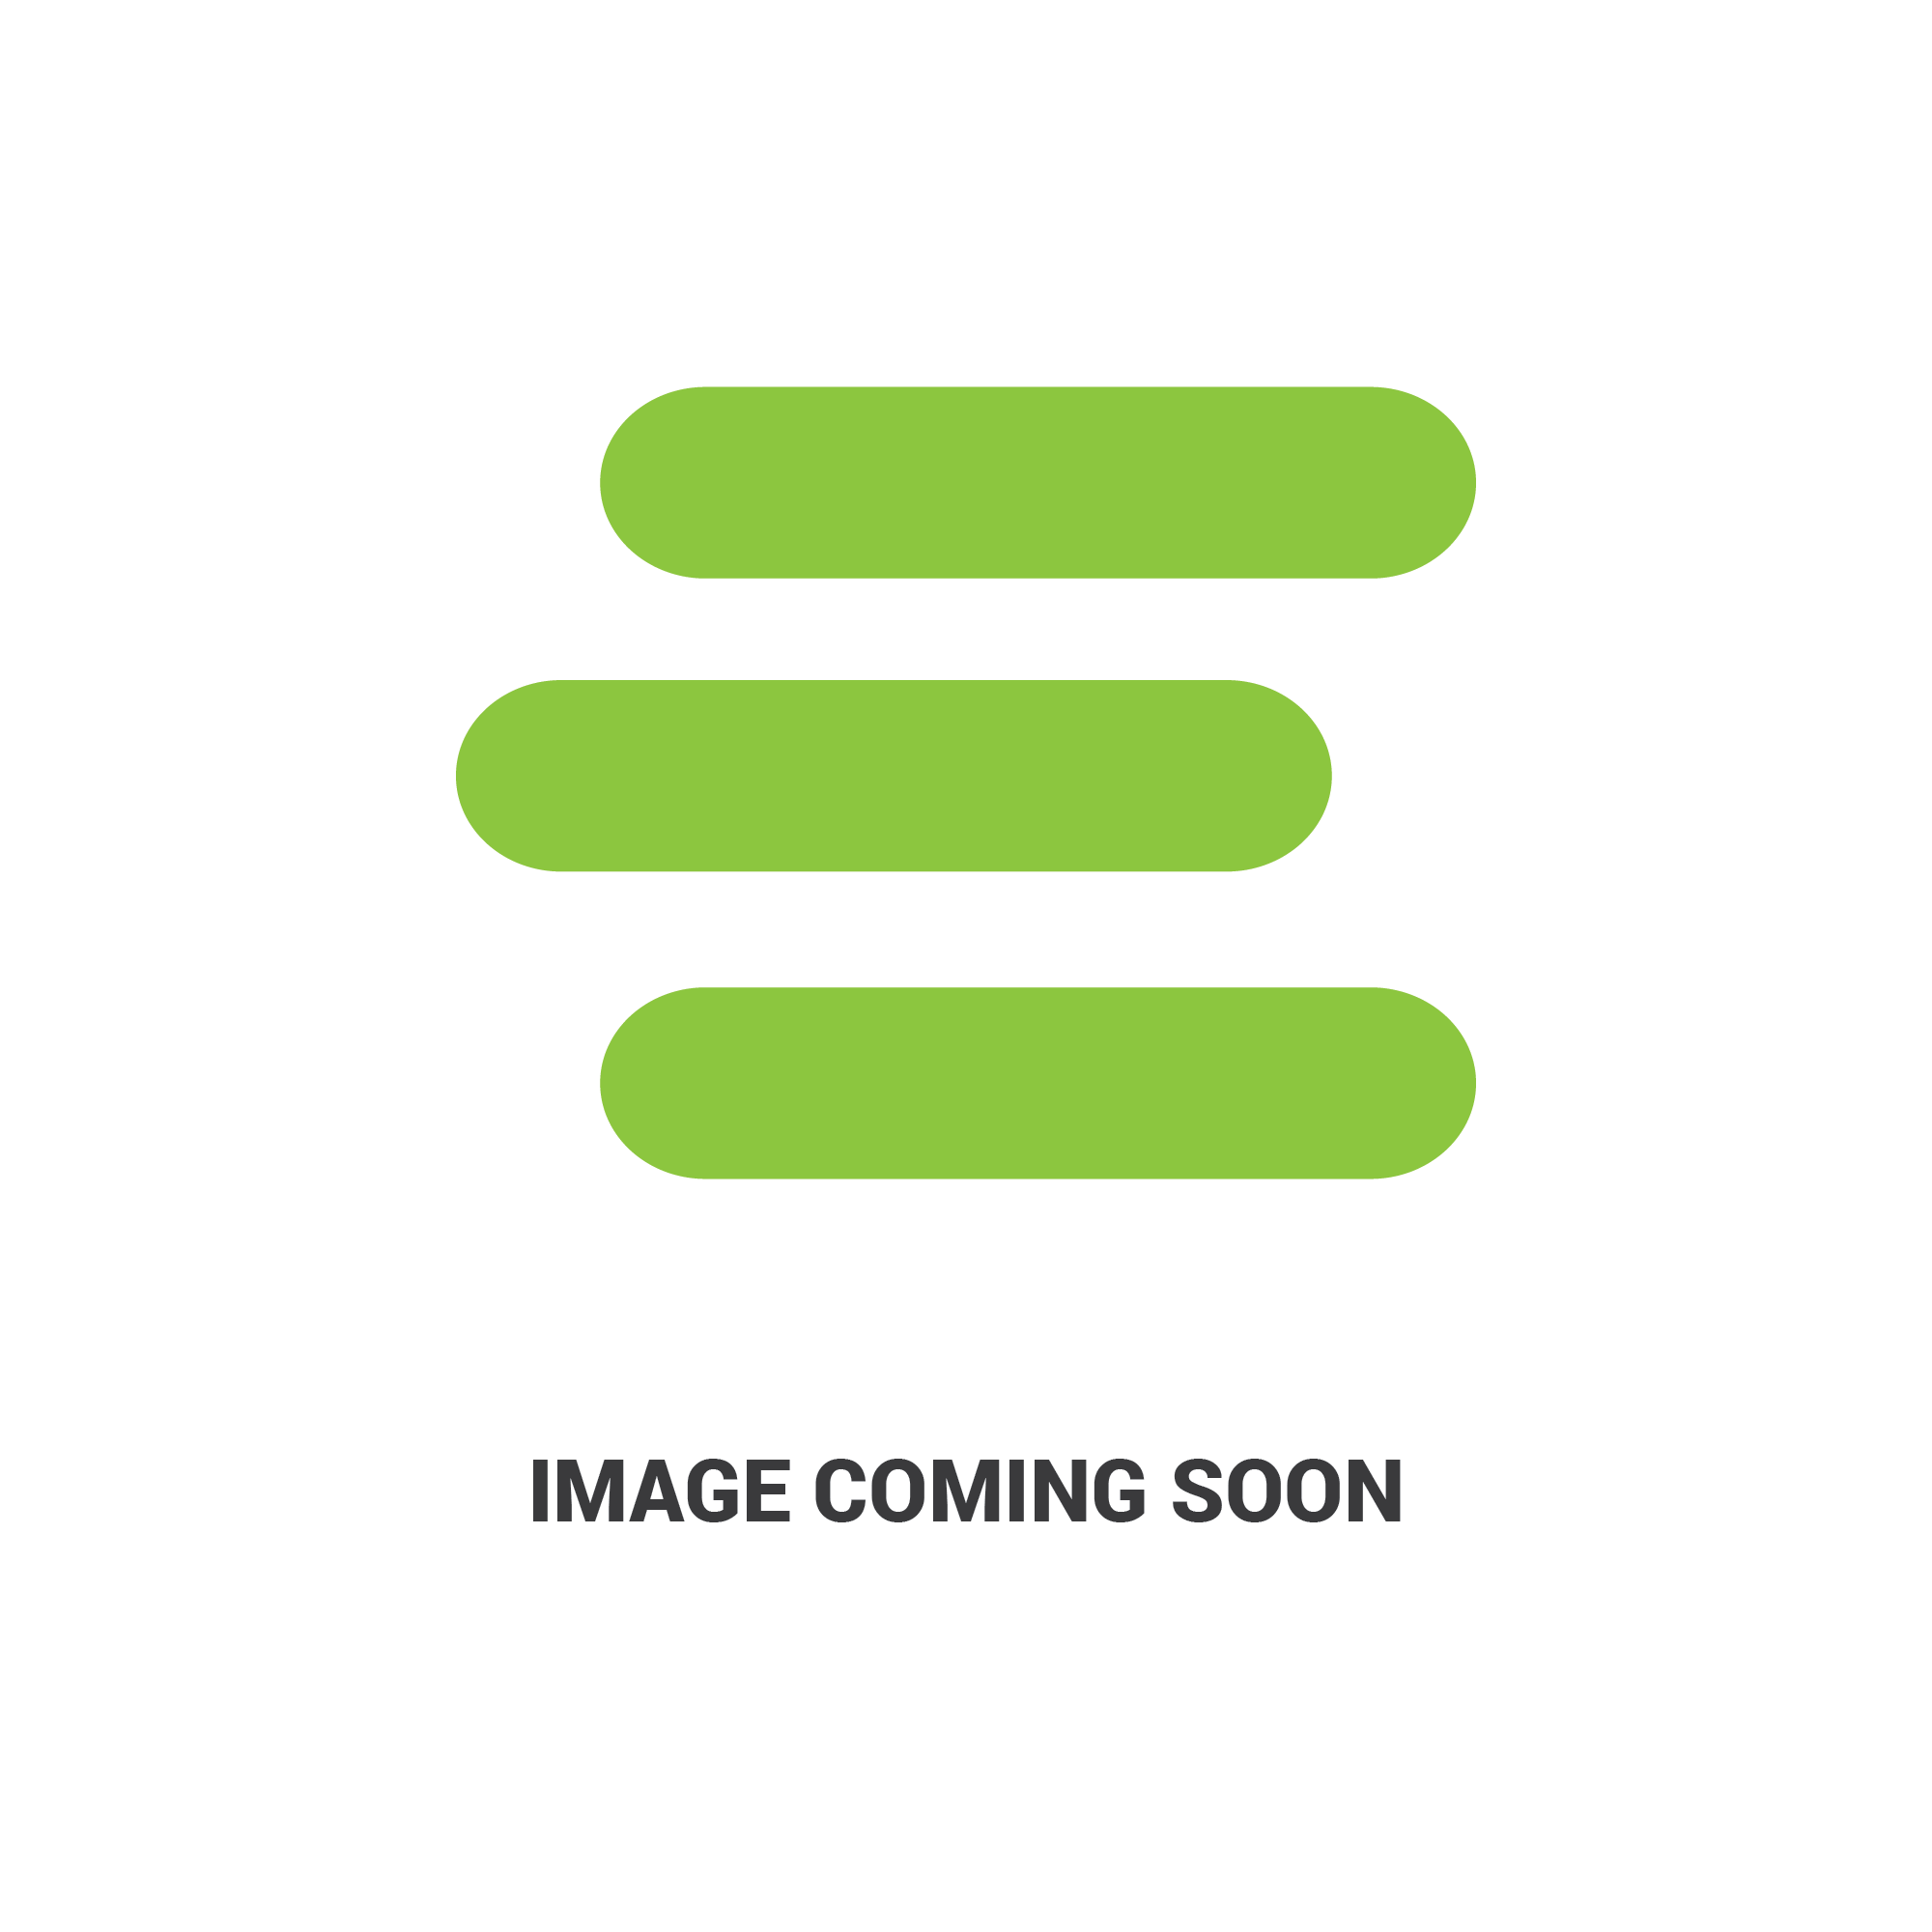 E-K2571-65120edit 142.jpg